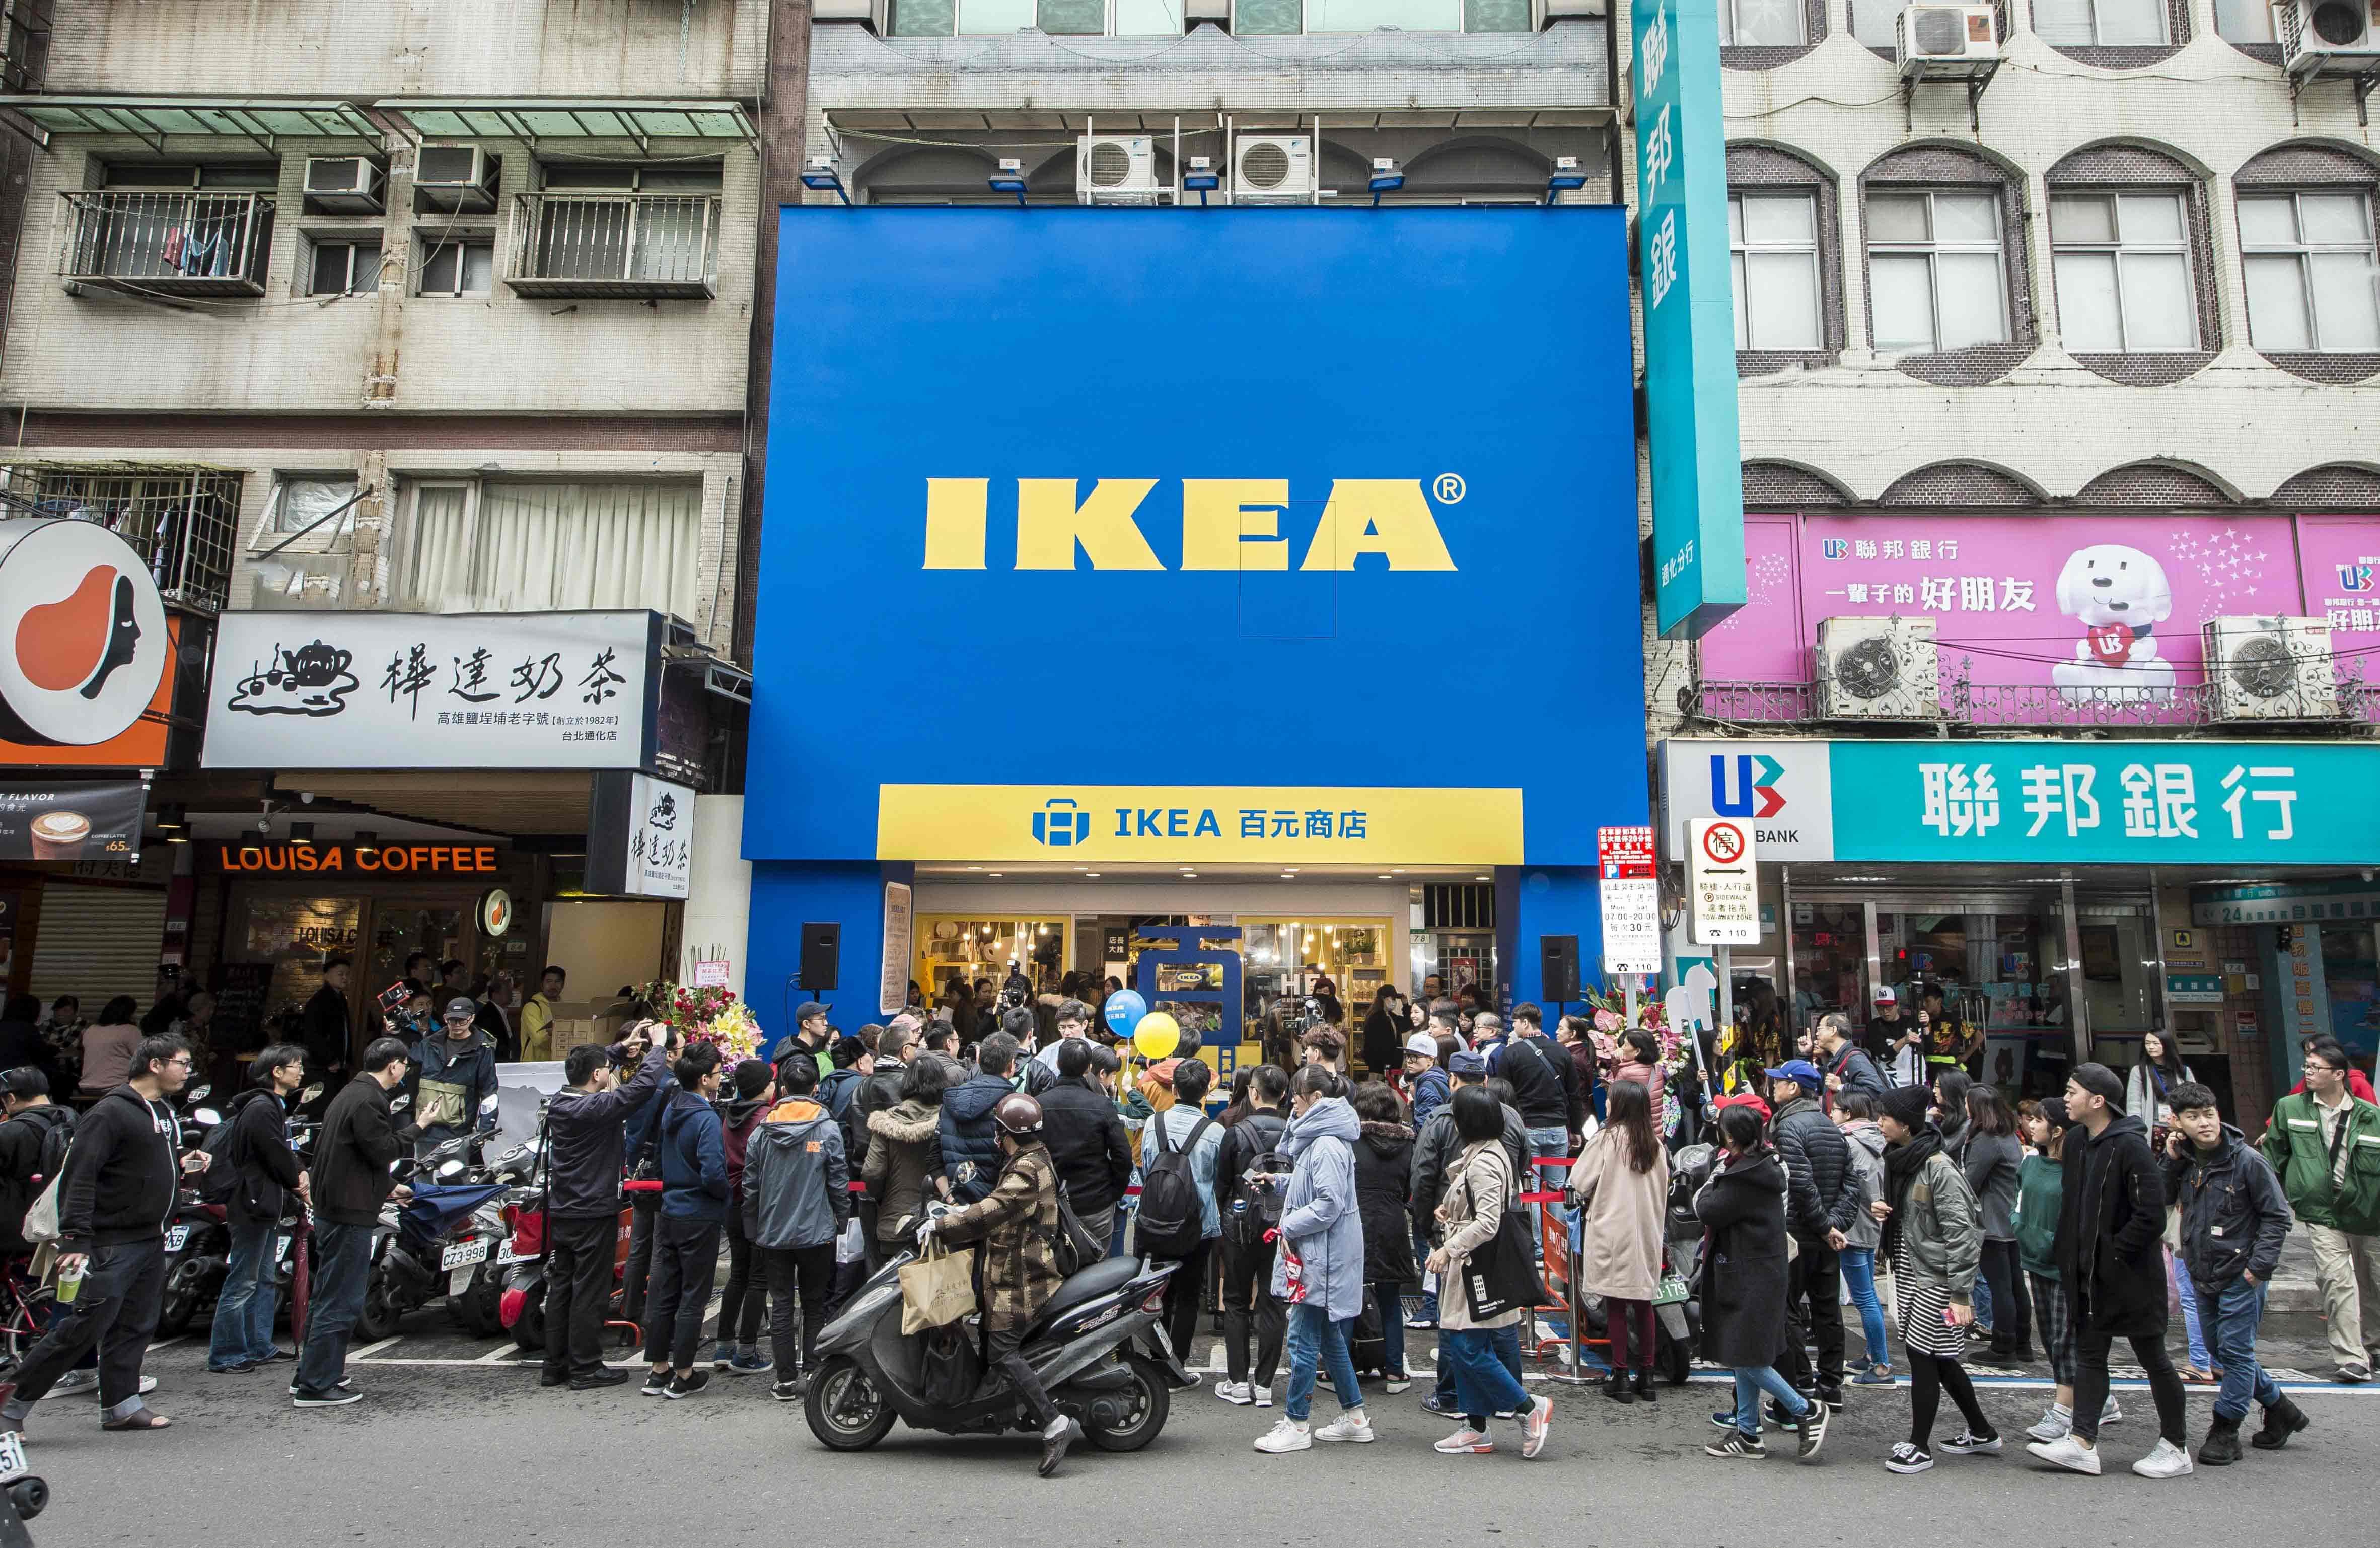 IKEA, , IKEA百元商店 通化店, Tonghua Night Market, Table, Night market, Furniture, Shop, , Do it yourself, ikea, People, Crowd, Town, Urban area, Transport, Street, City, Public space, Metropolitan area, Pedestrian